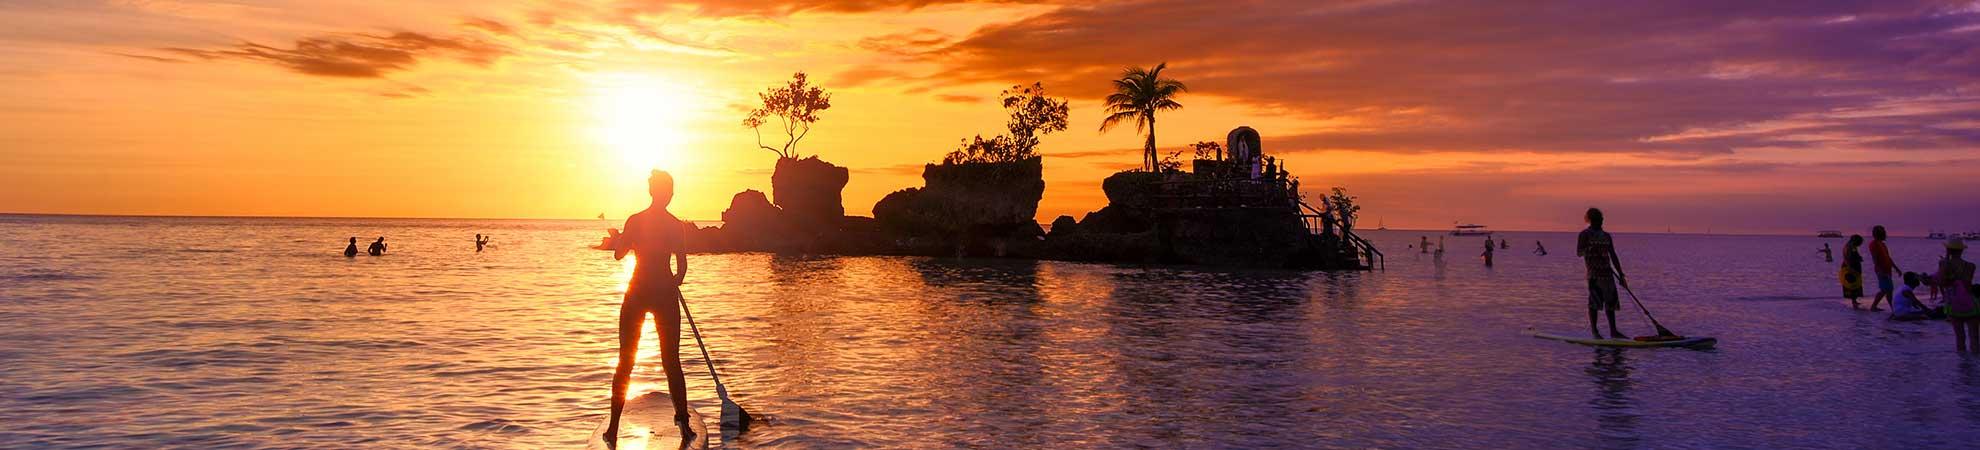 Vacances à Bali